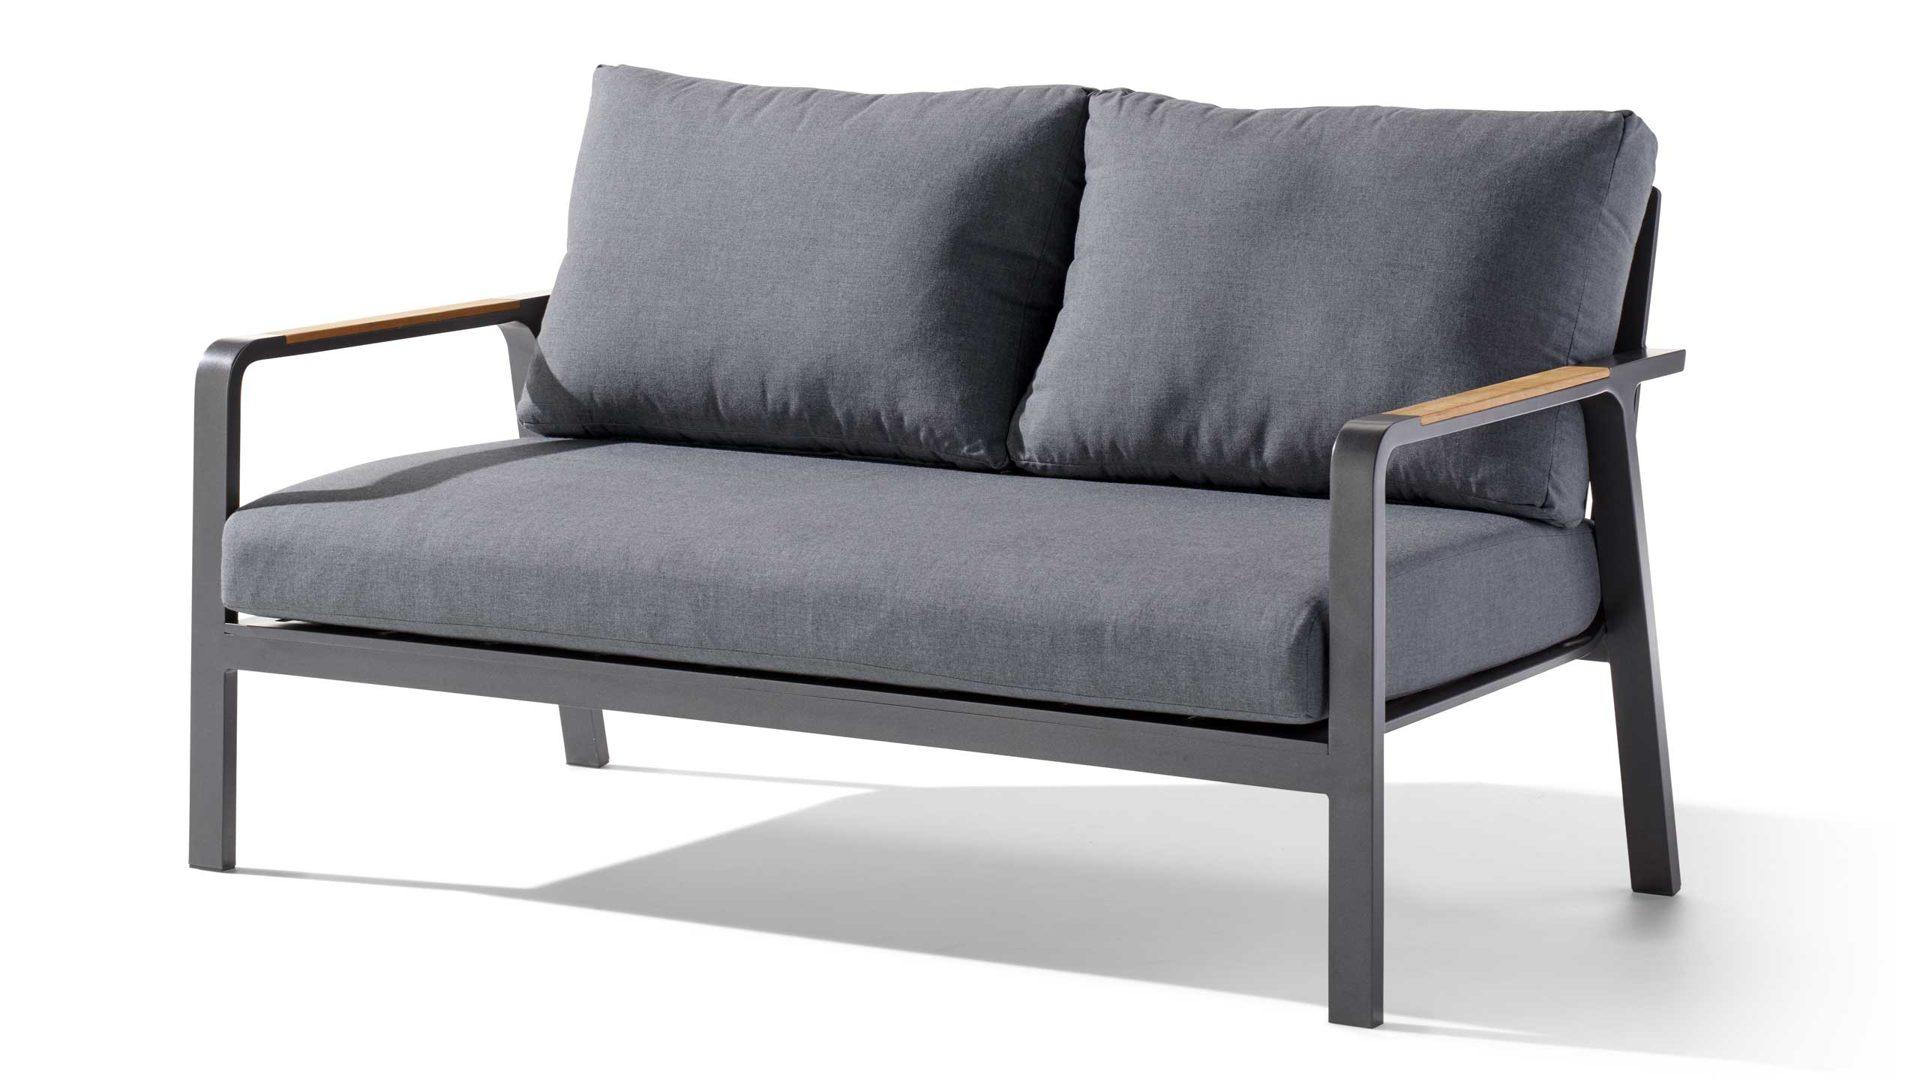 Sieger Exclusiv Sofa 2 Sitzer Nassau 432 G G Gestell Aluminium